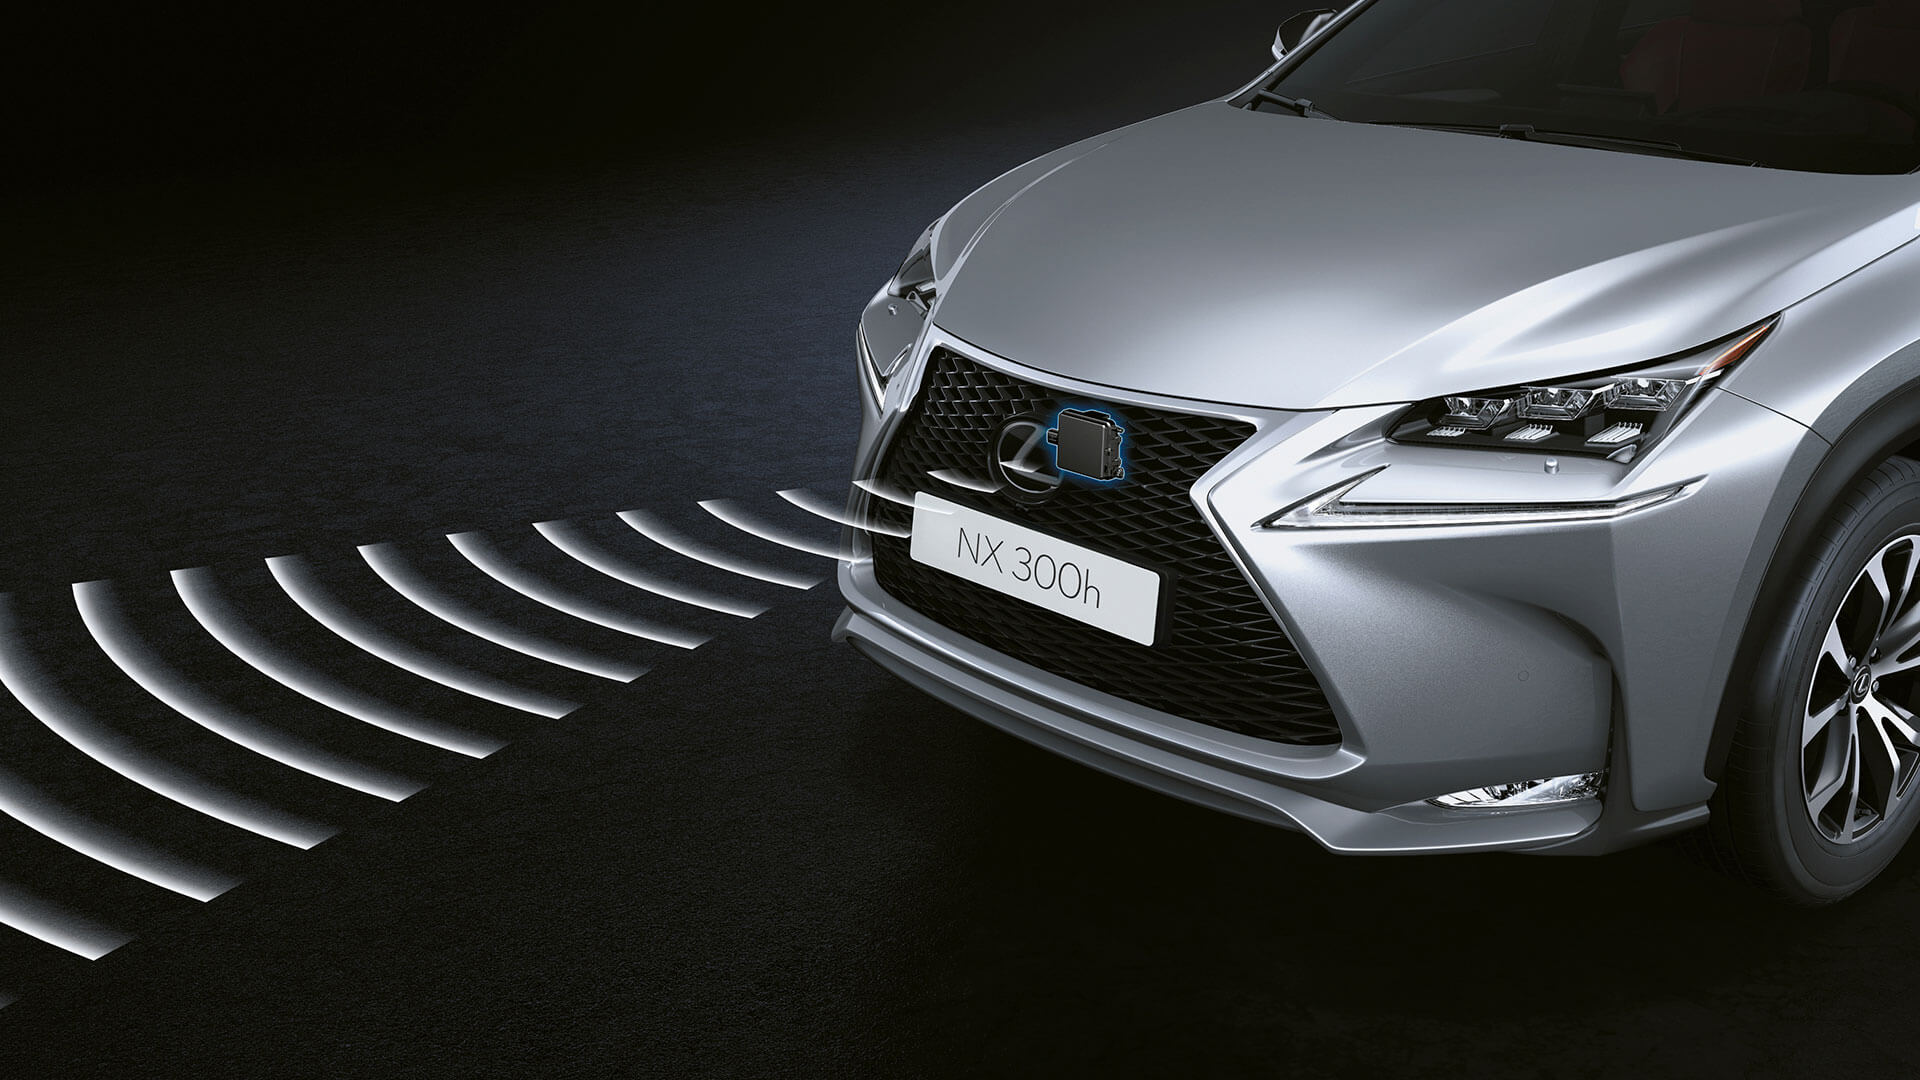 2017 lexus nx 300h features adaptive cruise control